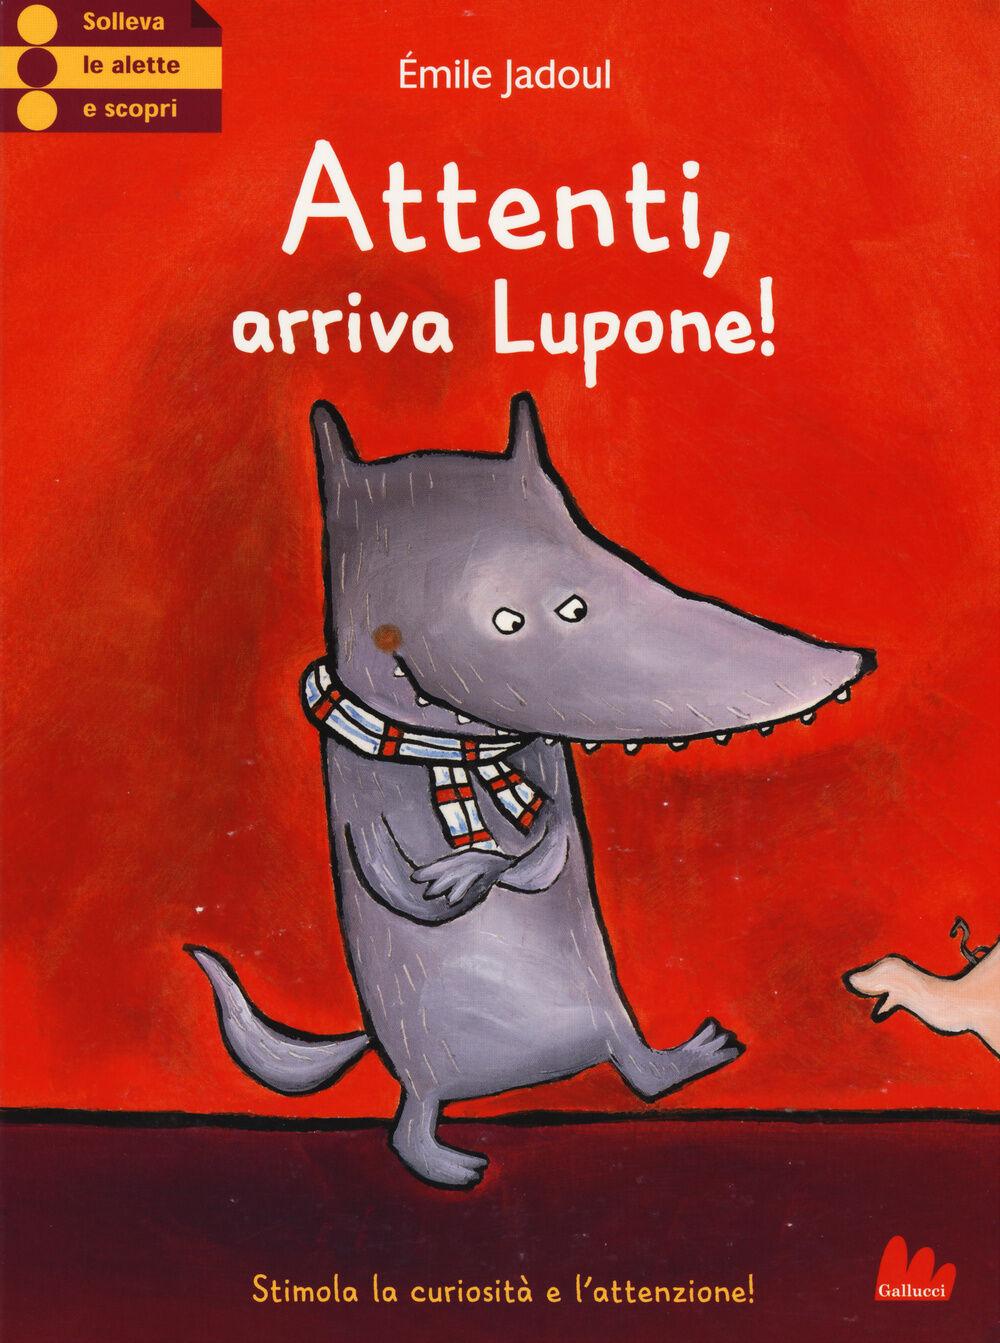 Attenti, arriva Lupone!